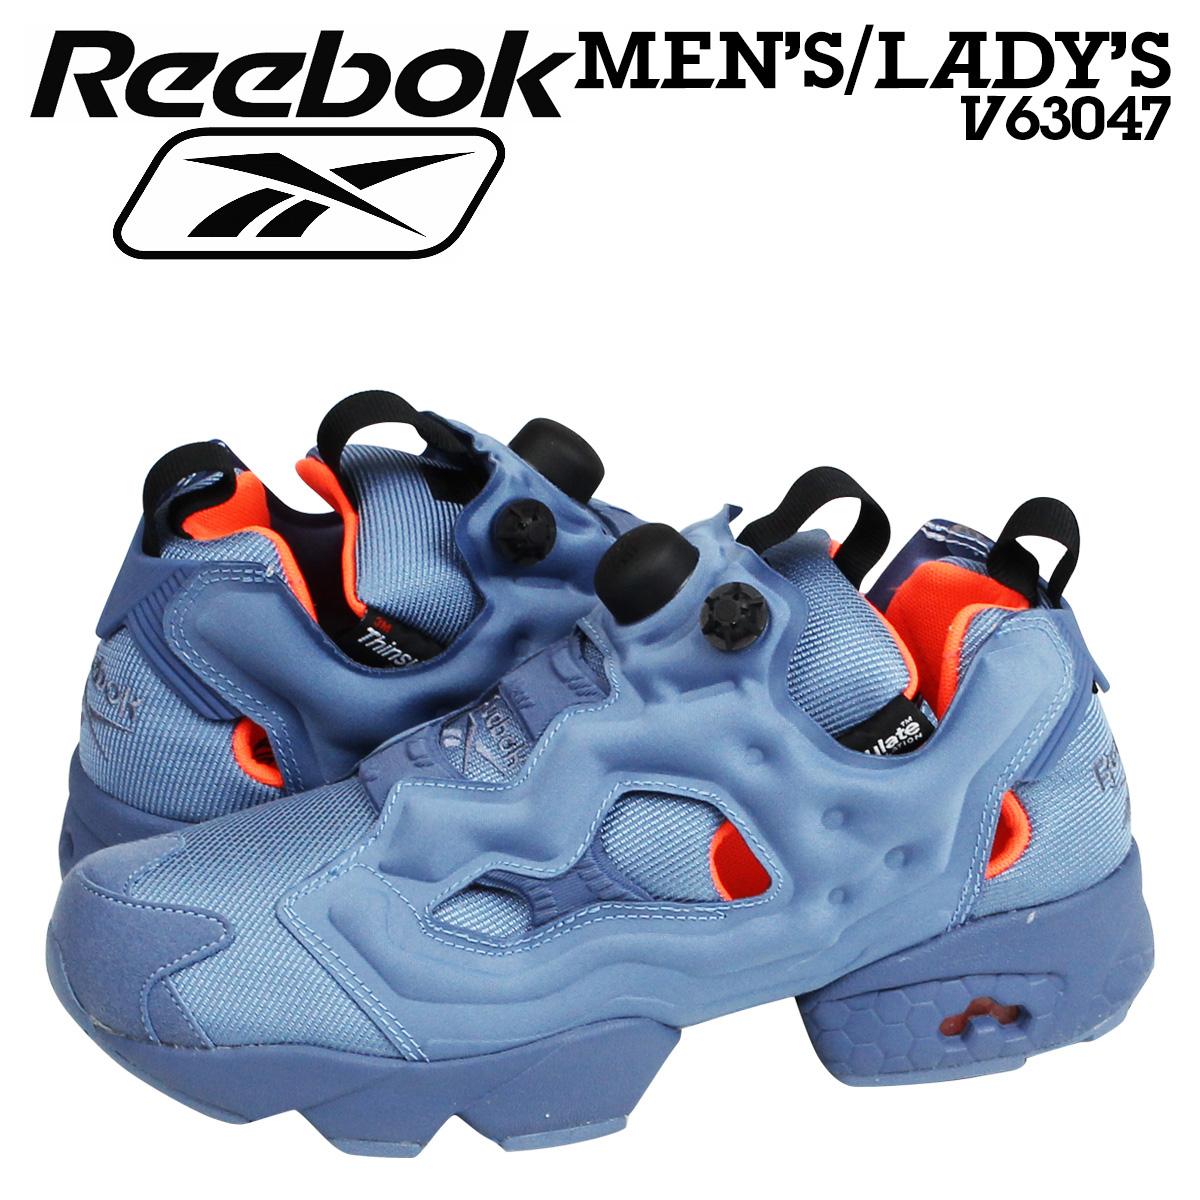 Reebok リーボック インスタ ポンプフューリー スニーカー INSTAPUMP FURY TECH V63047 メンズ レディース 靴 ブルー